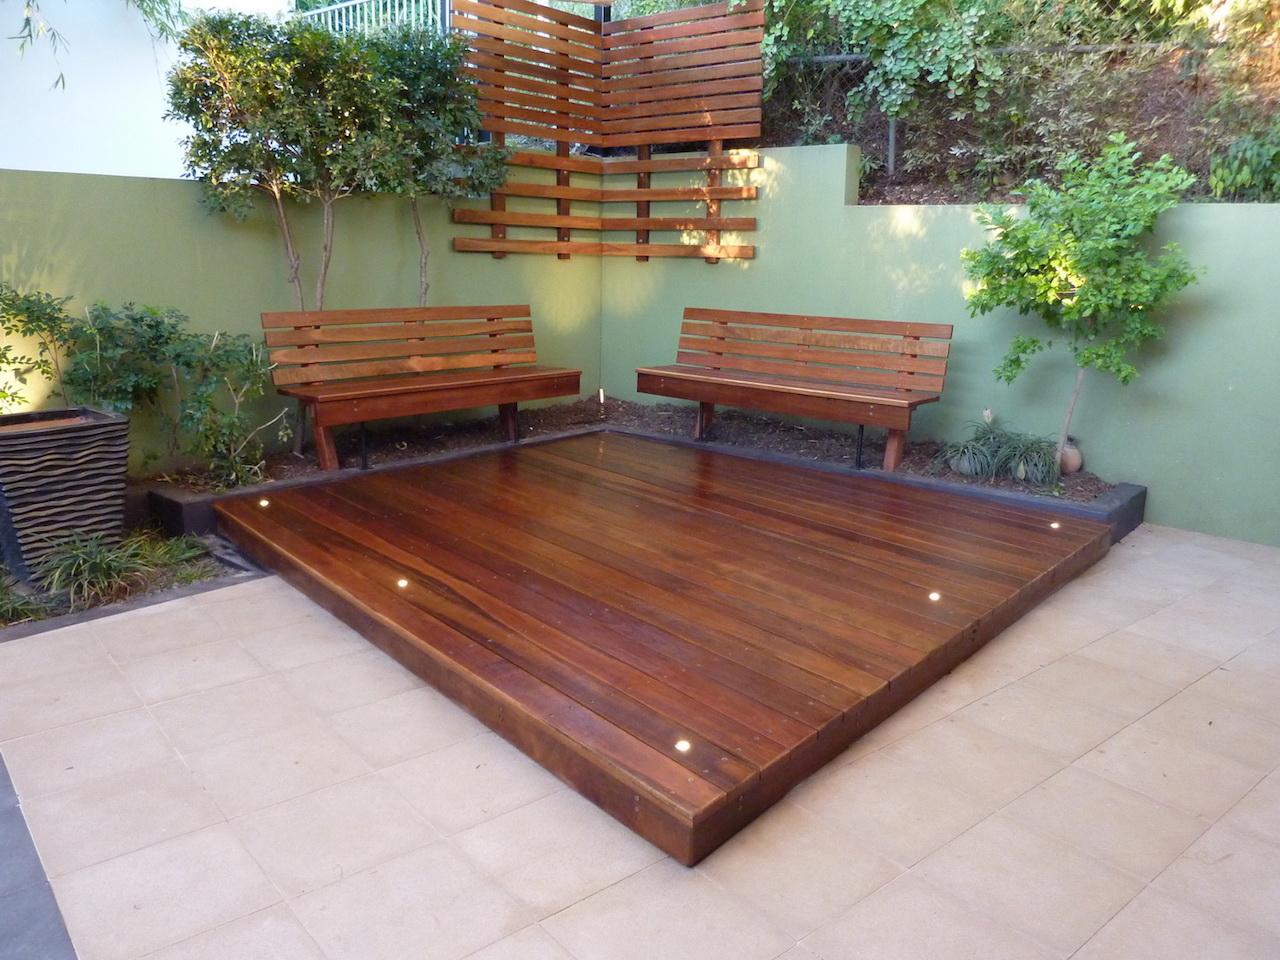 Timber Decks - Fillmore Play deck